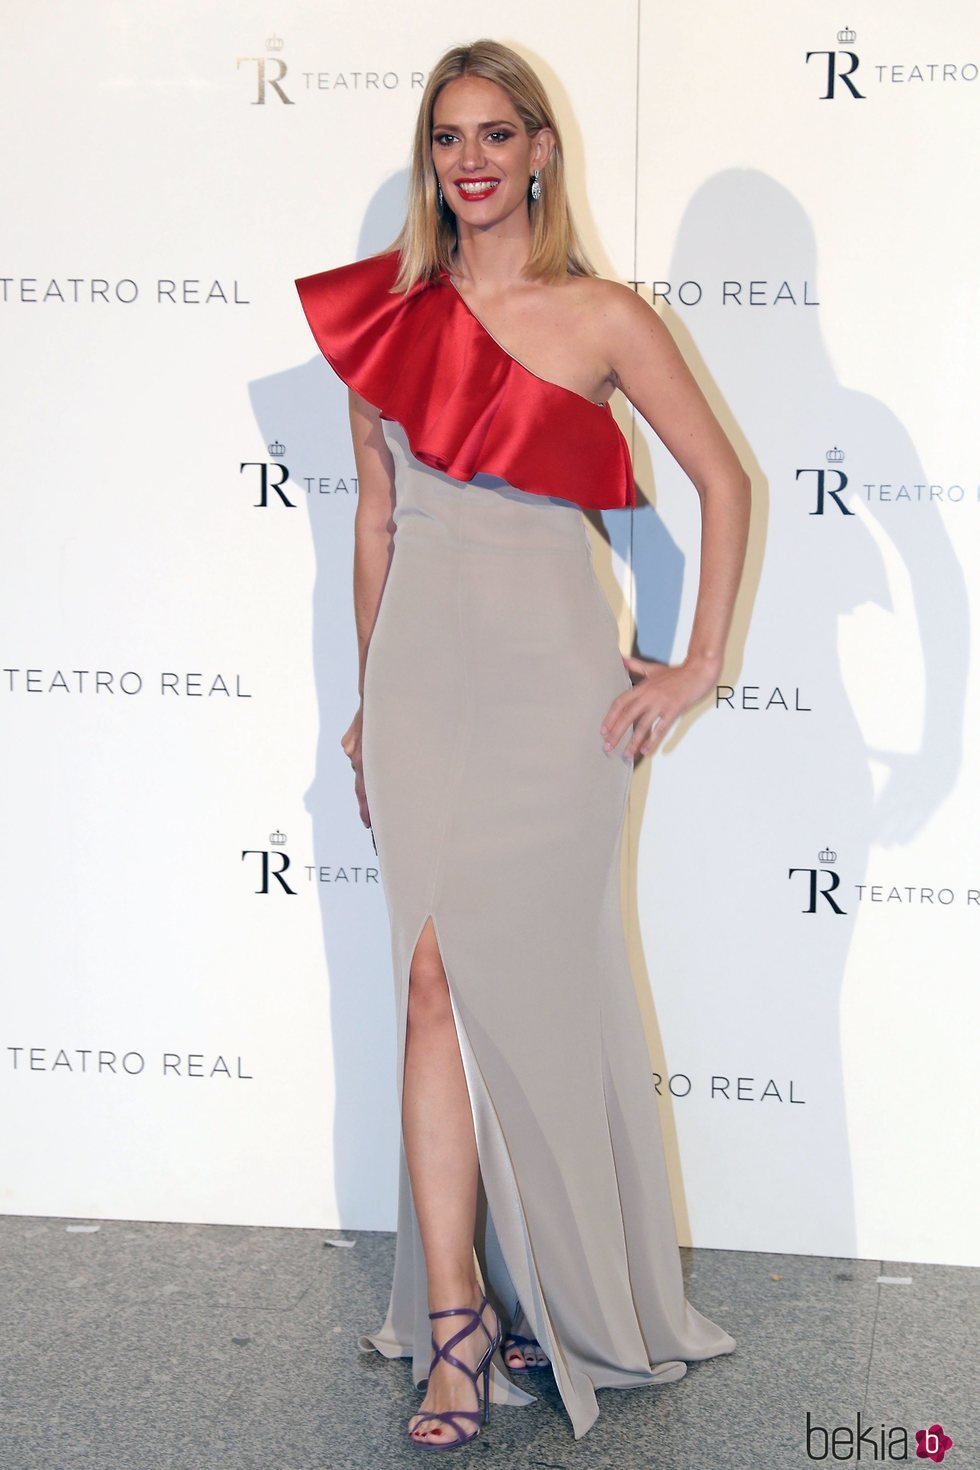 Teresa Baca en la Gala Anual Teatro Real 2018